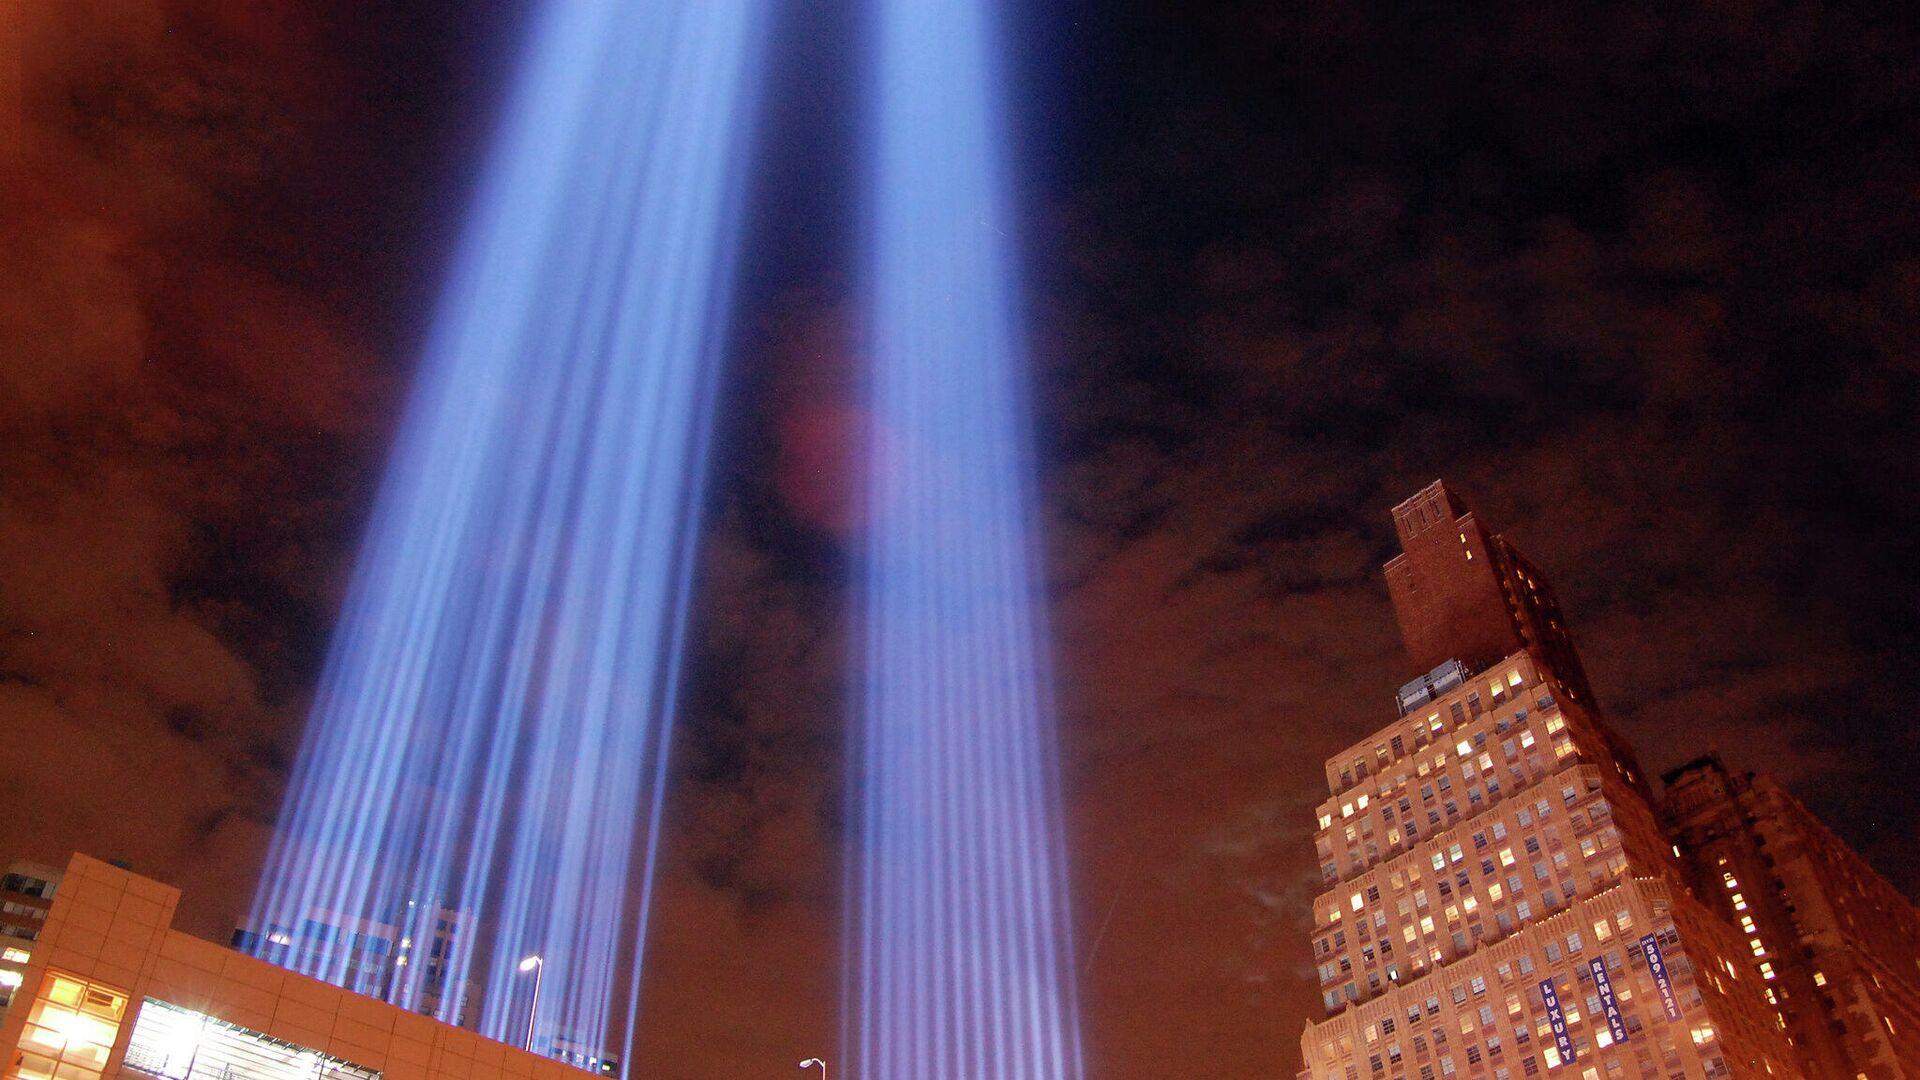 9/11 Tribute in Light  - Sputnik International, 1920, 11.09.2021